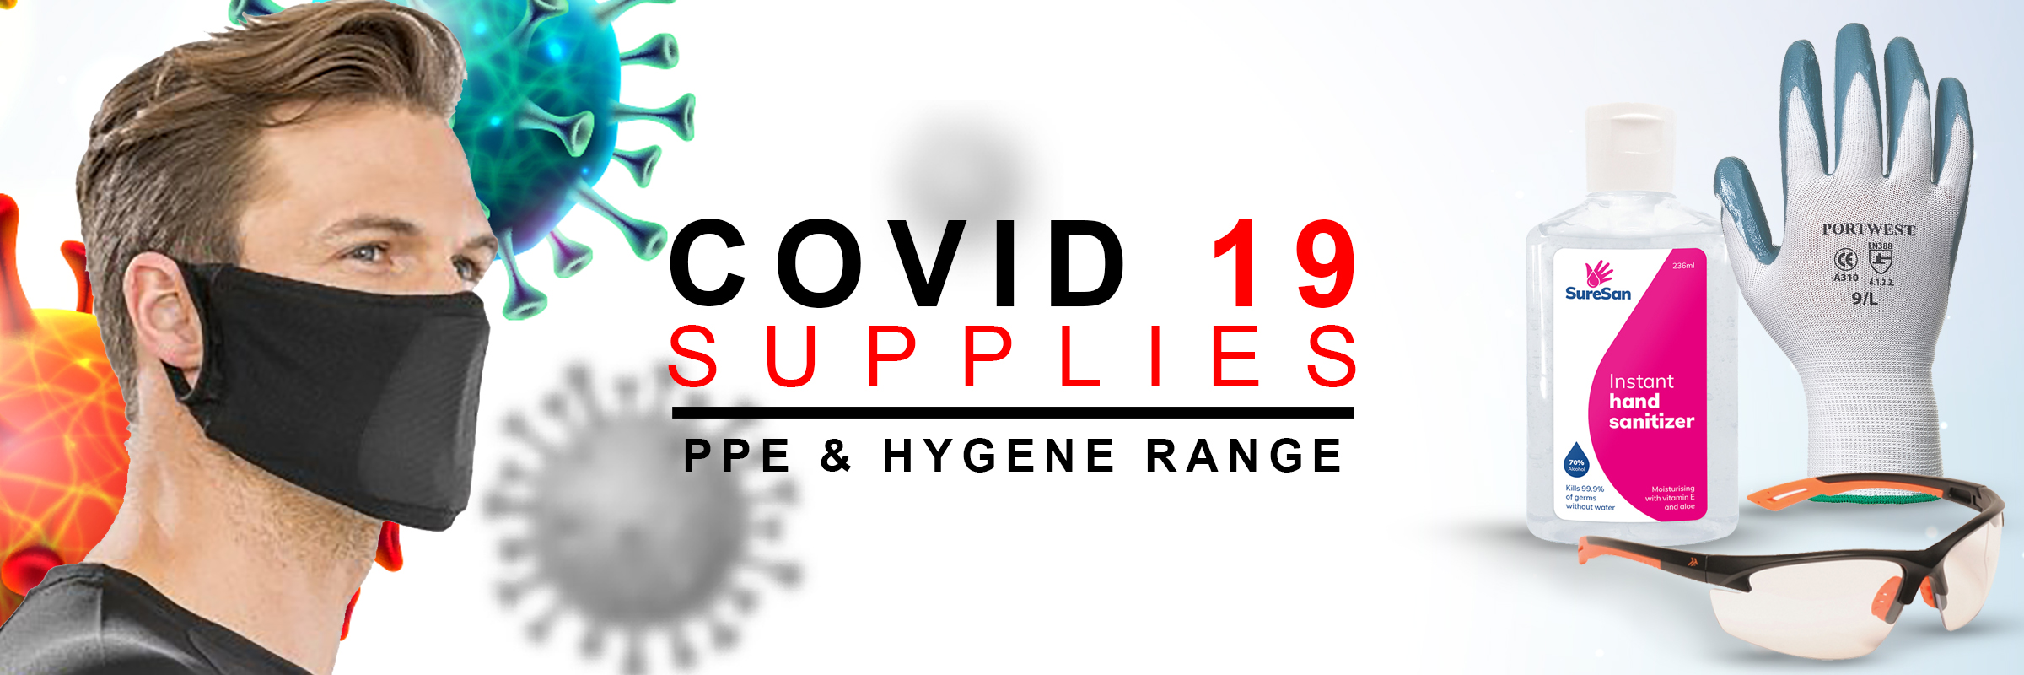 COVID 19 - Face Masks & PPE